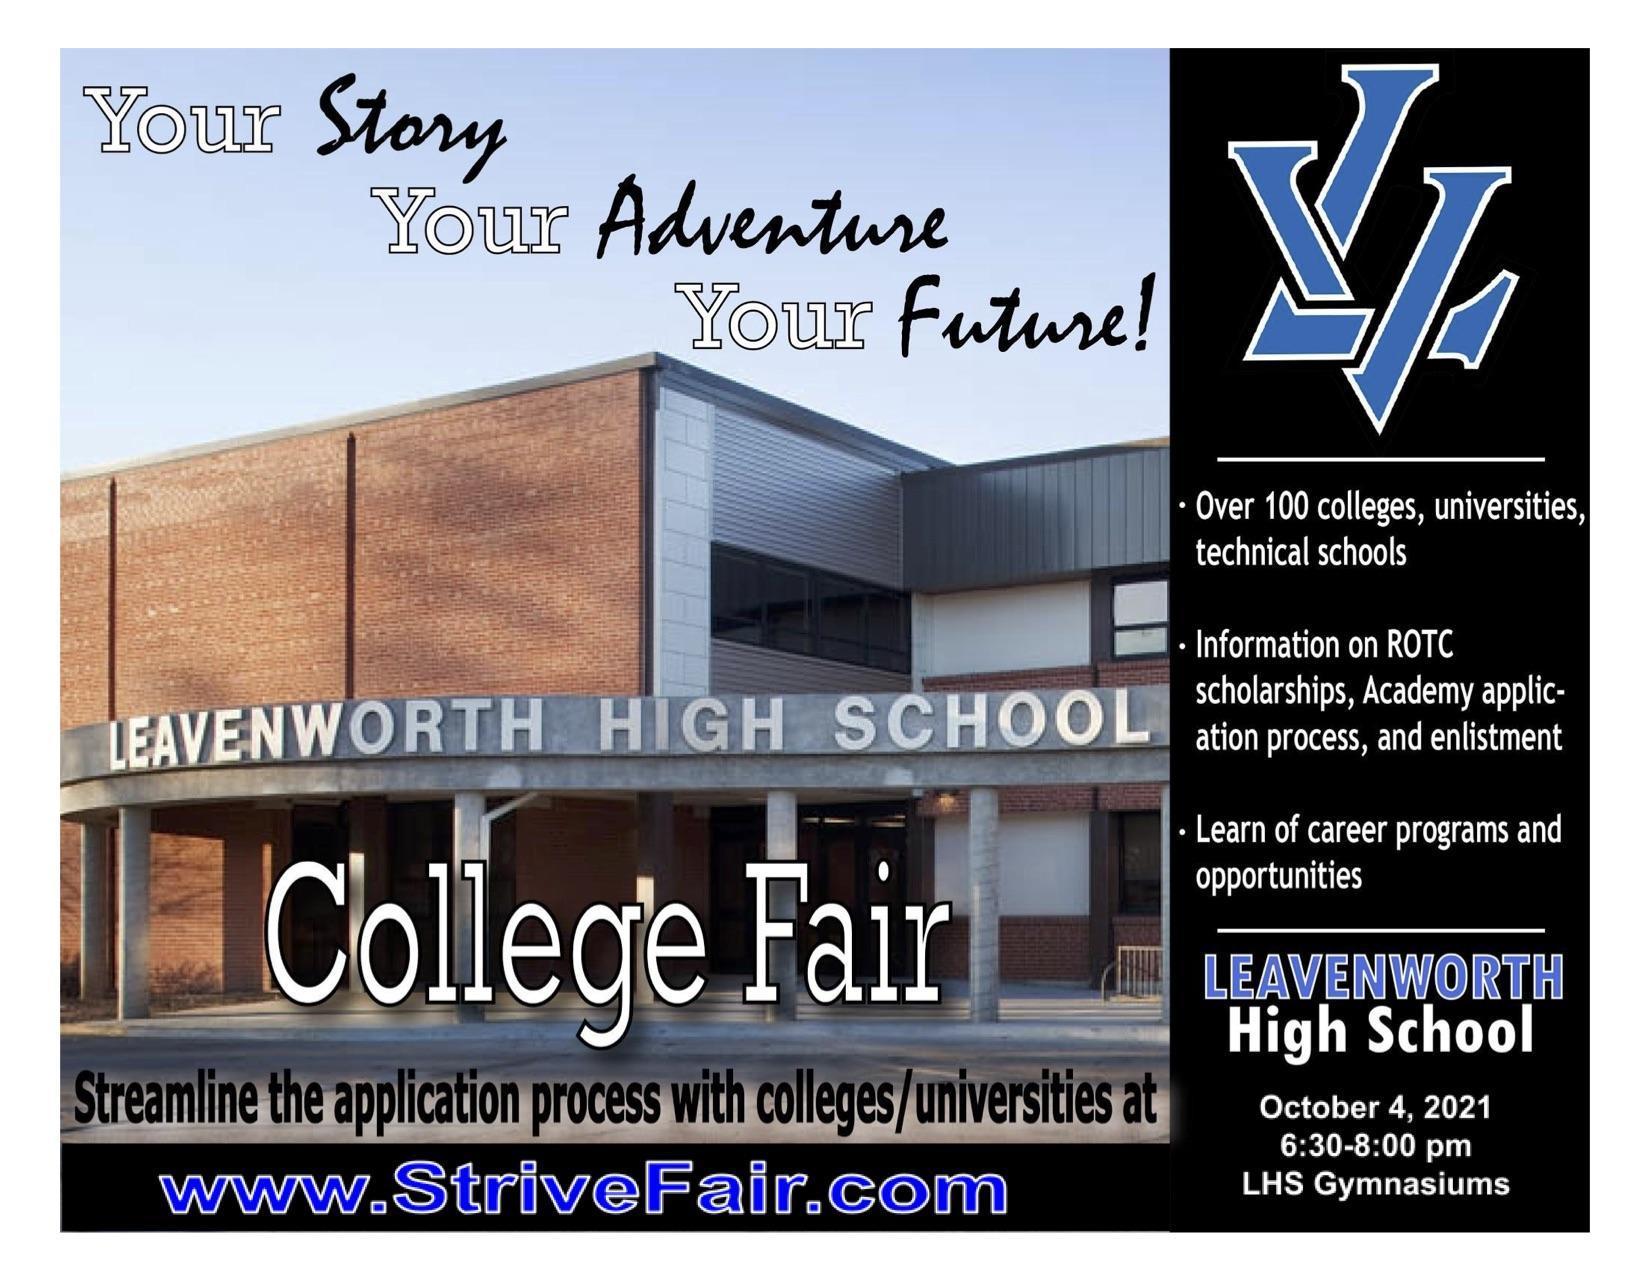 Leavenworth High School College Fair